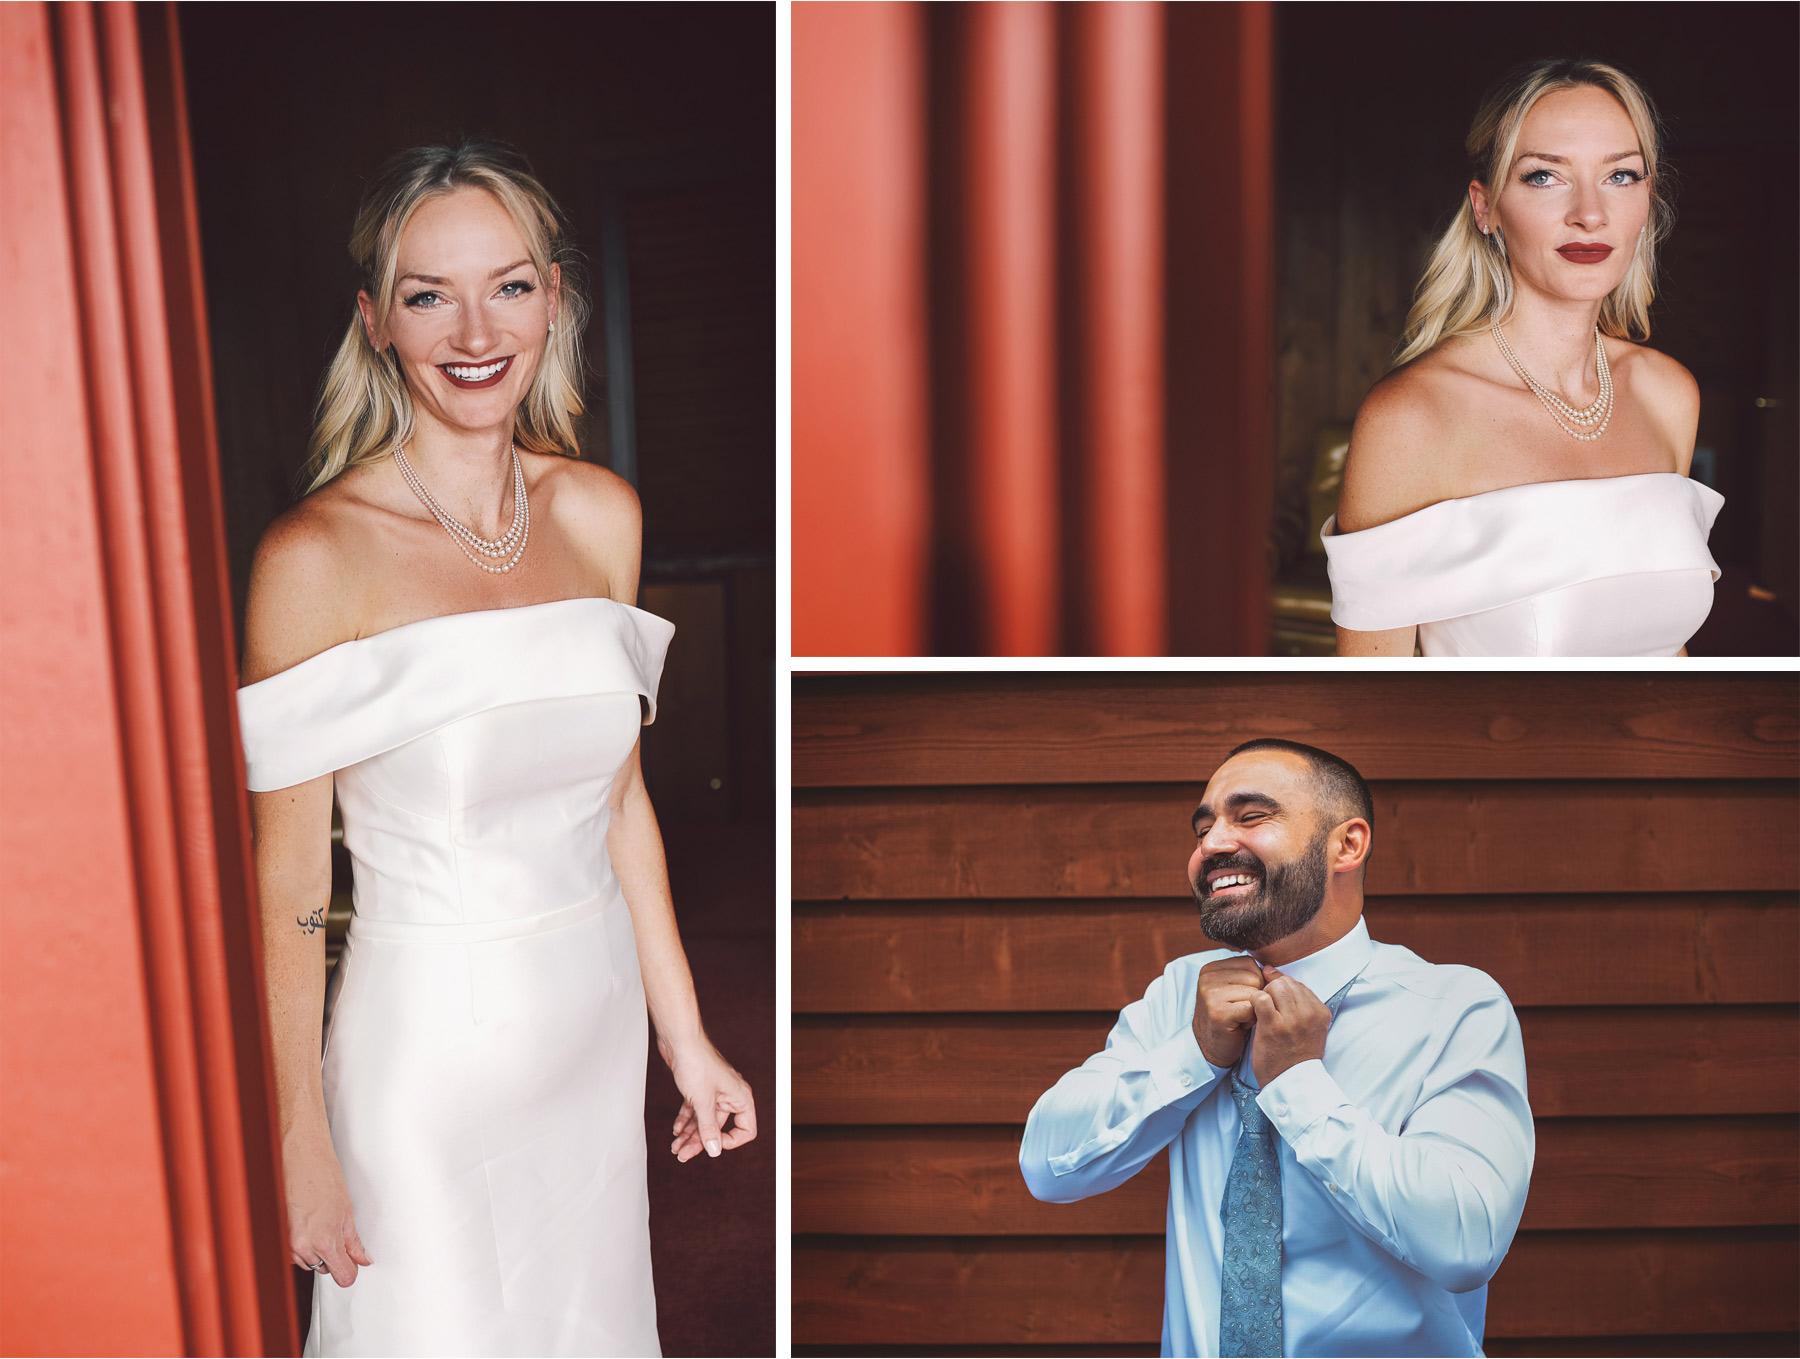 02-Ely-Minnesota-North-Wedding-by-Andrew-Vick-Photography-Bride-Groom-Cabin-Katie-and-Joe.jpg